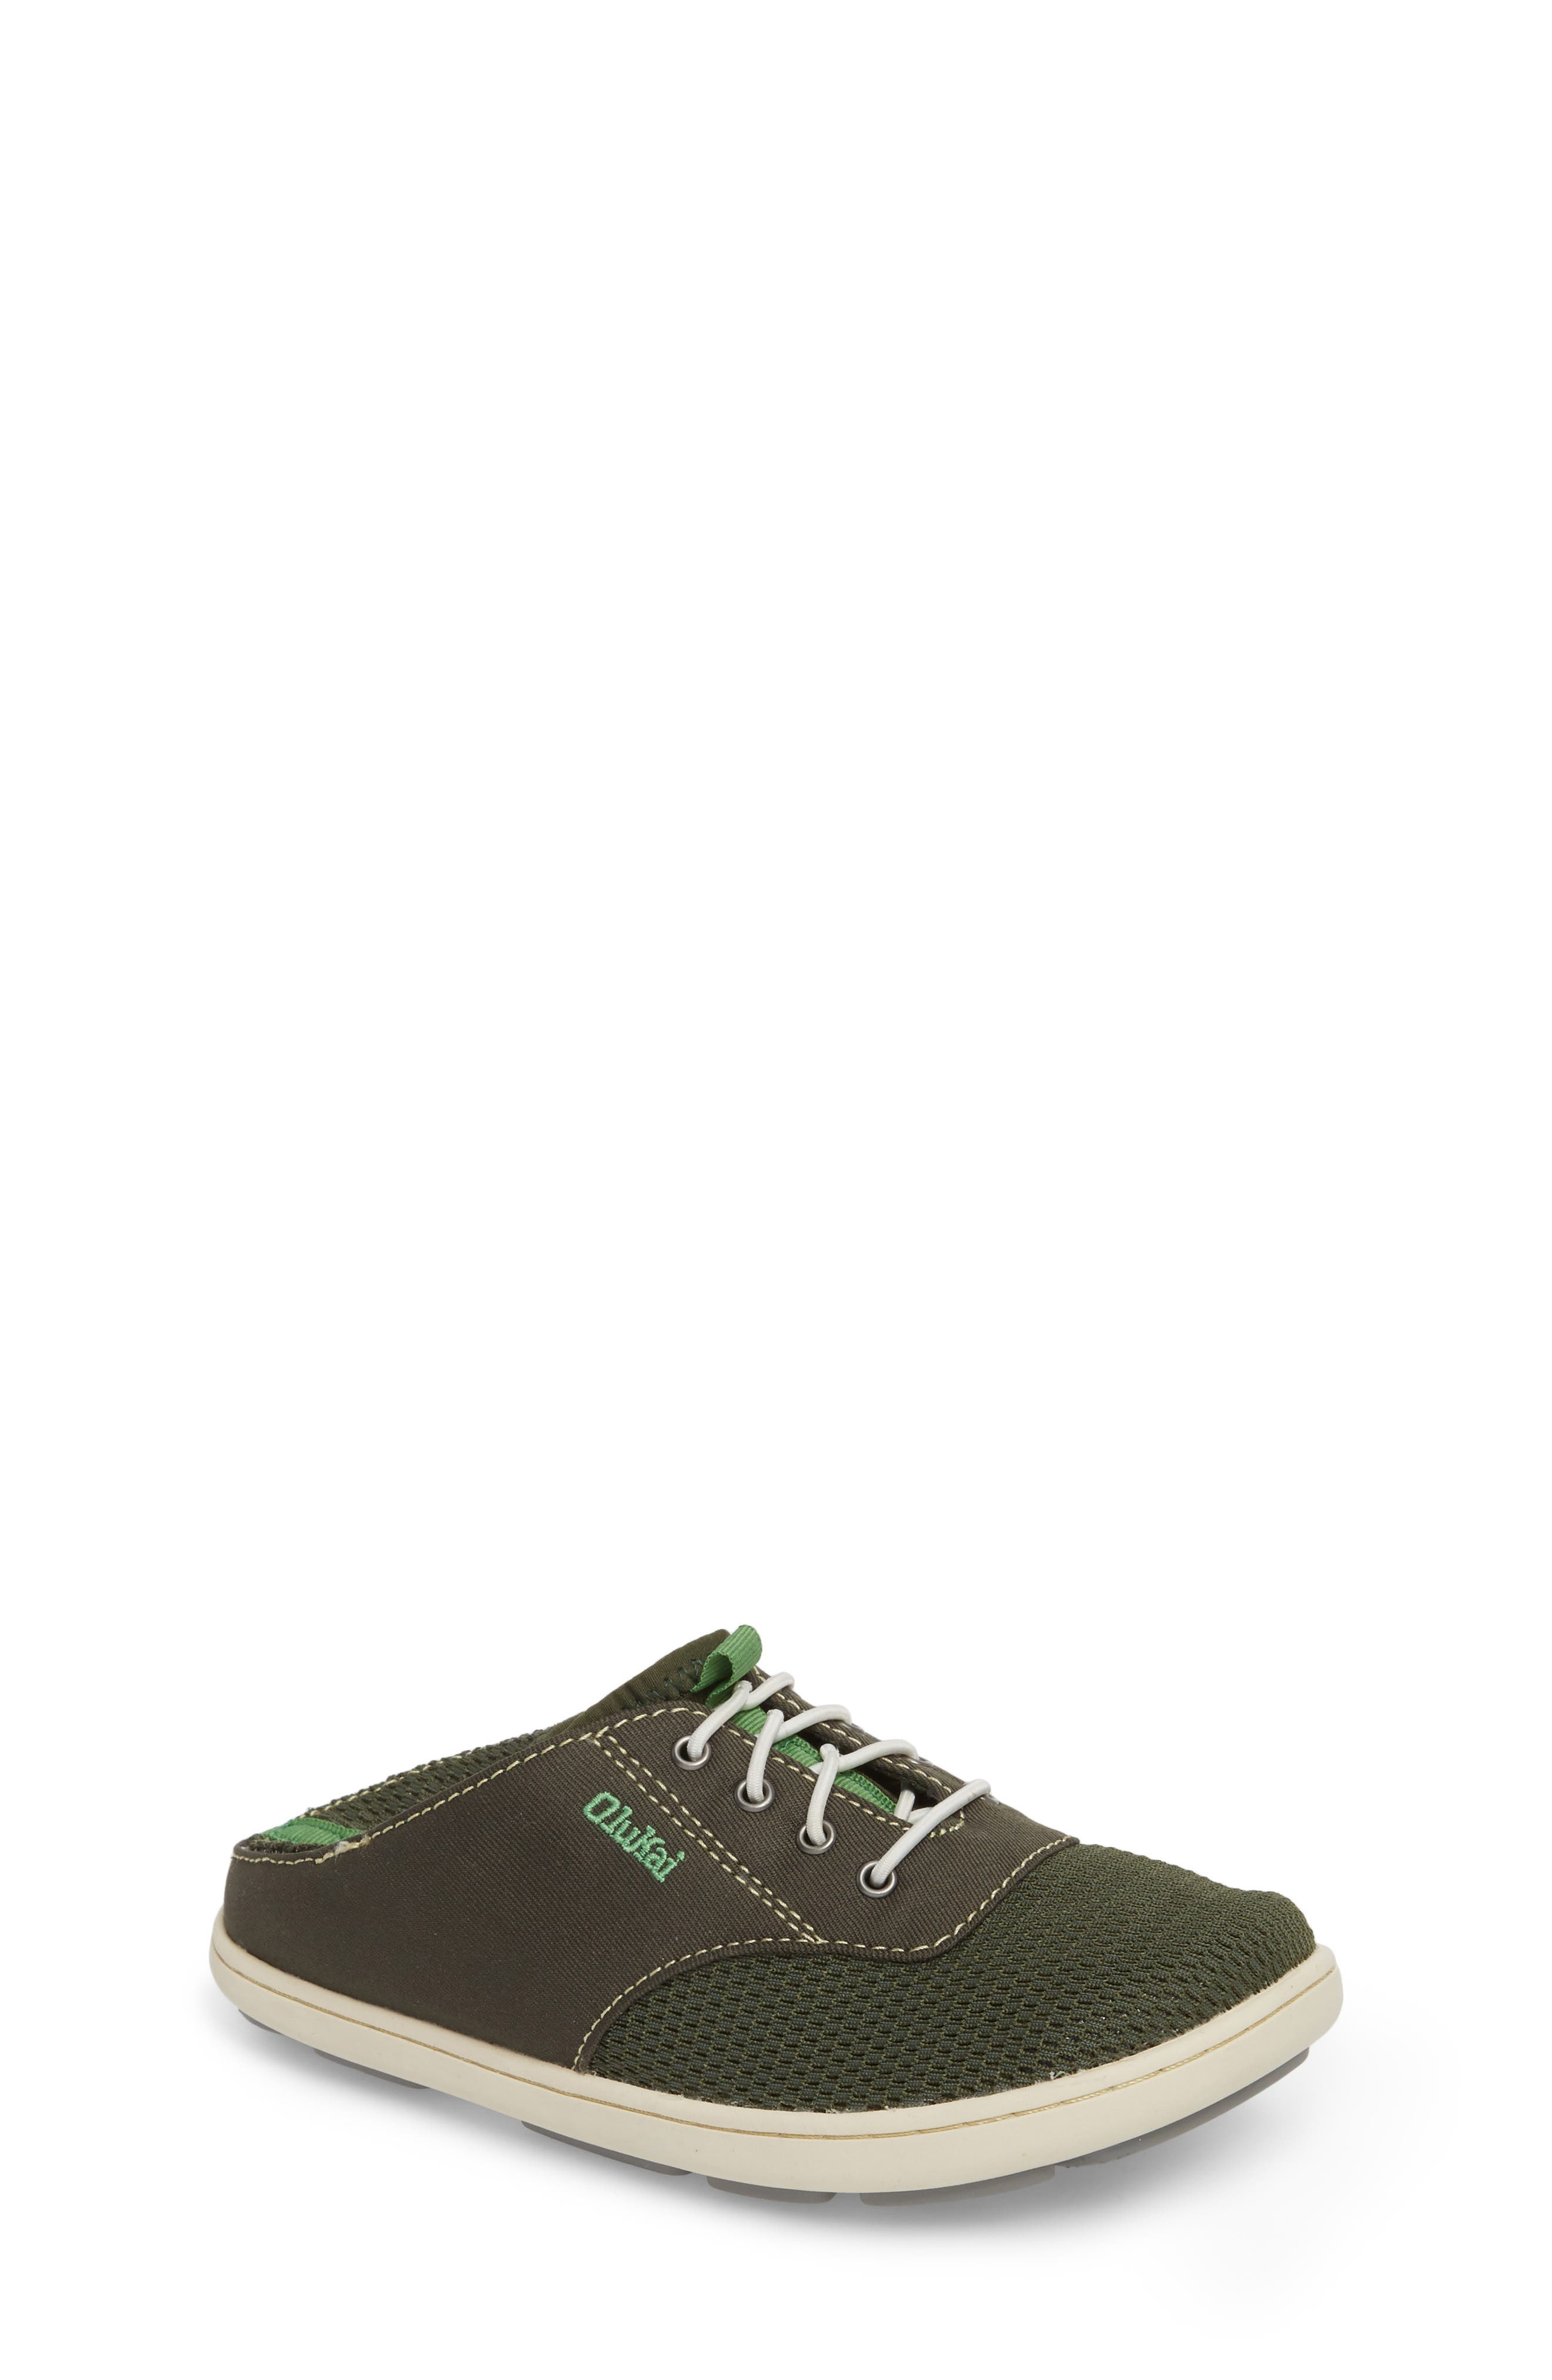 Nohea Moku Water Resistant Shoe,                             Main thumbnail 1, color,                             SEA GRASS/ SEA GRASS